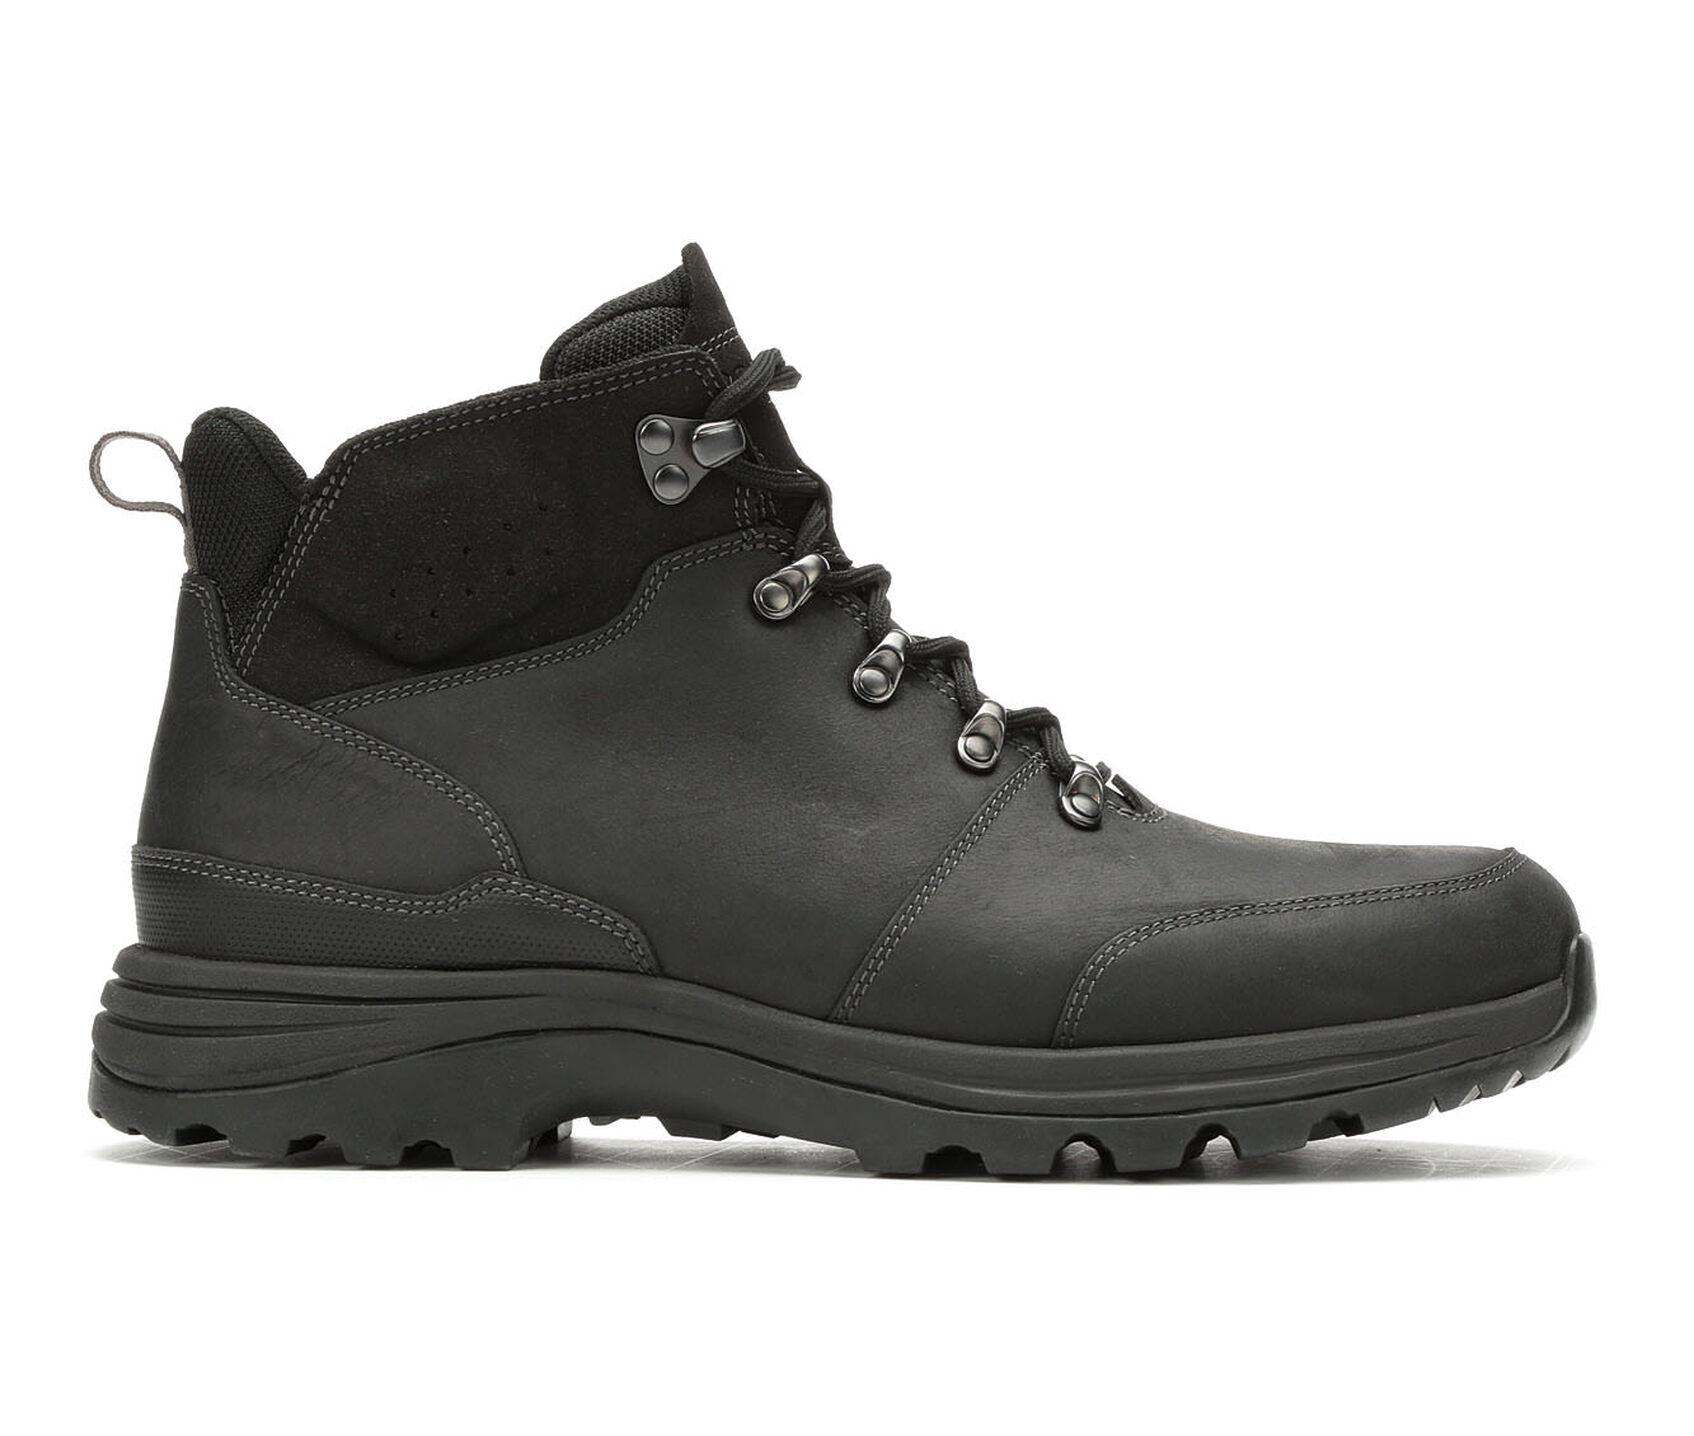 Men S Rockport Xcs Mudguard Boots Shoe Carnival